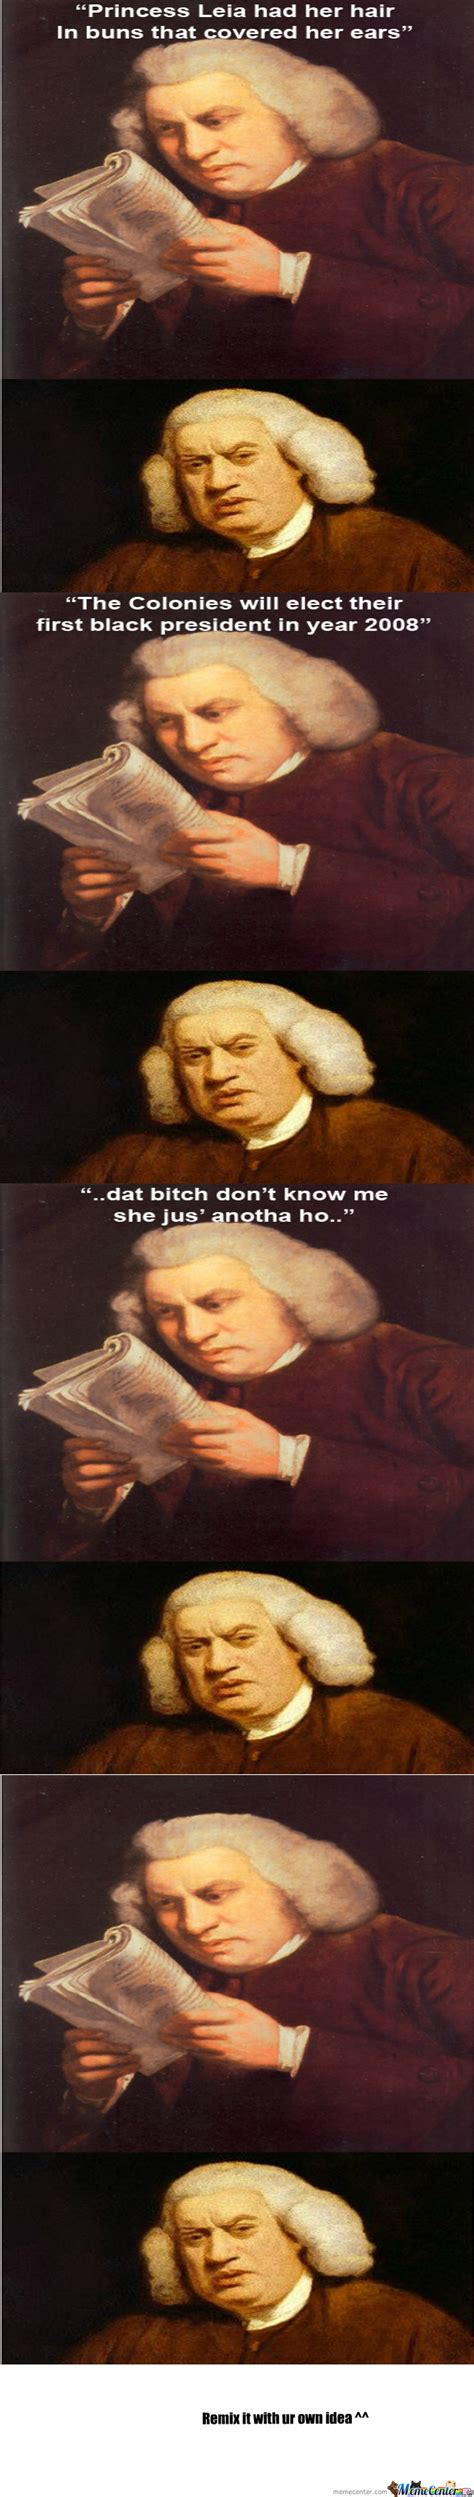 Samuel Johnson Meme - disturbed sam johnson by pierceym meme center